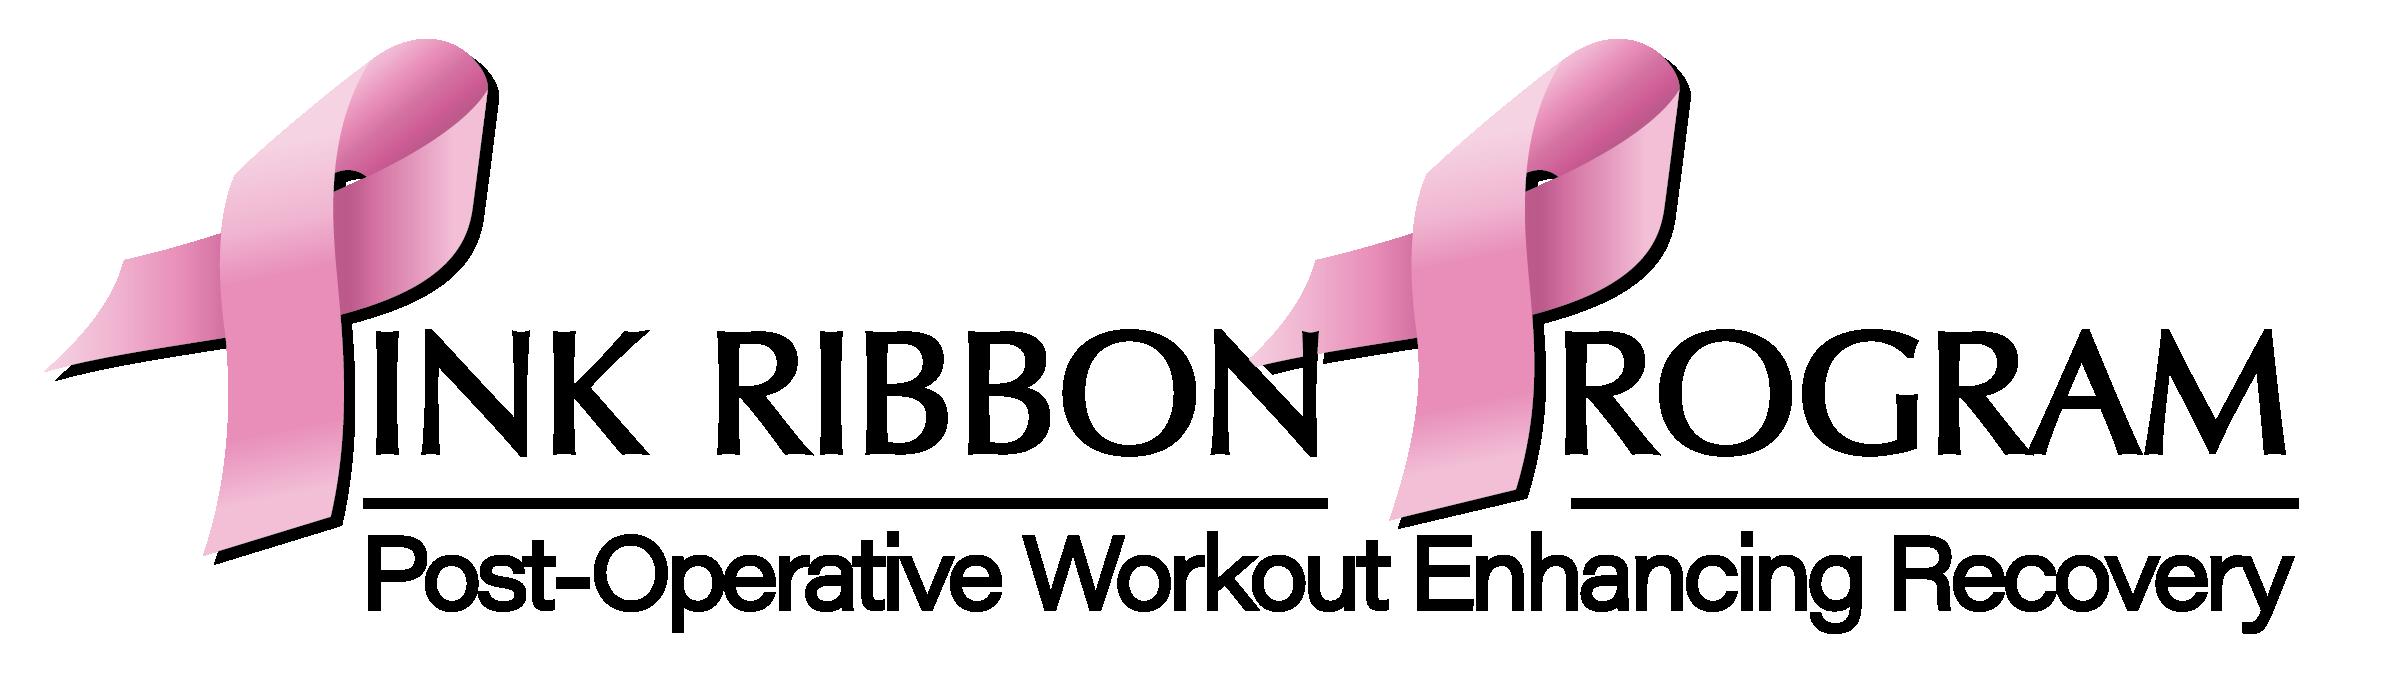 PinkRibbonProgram-Logo-01.png